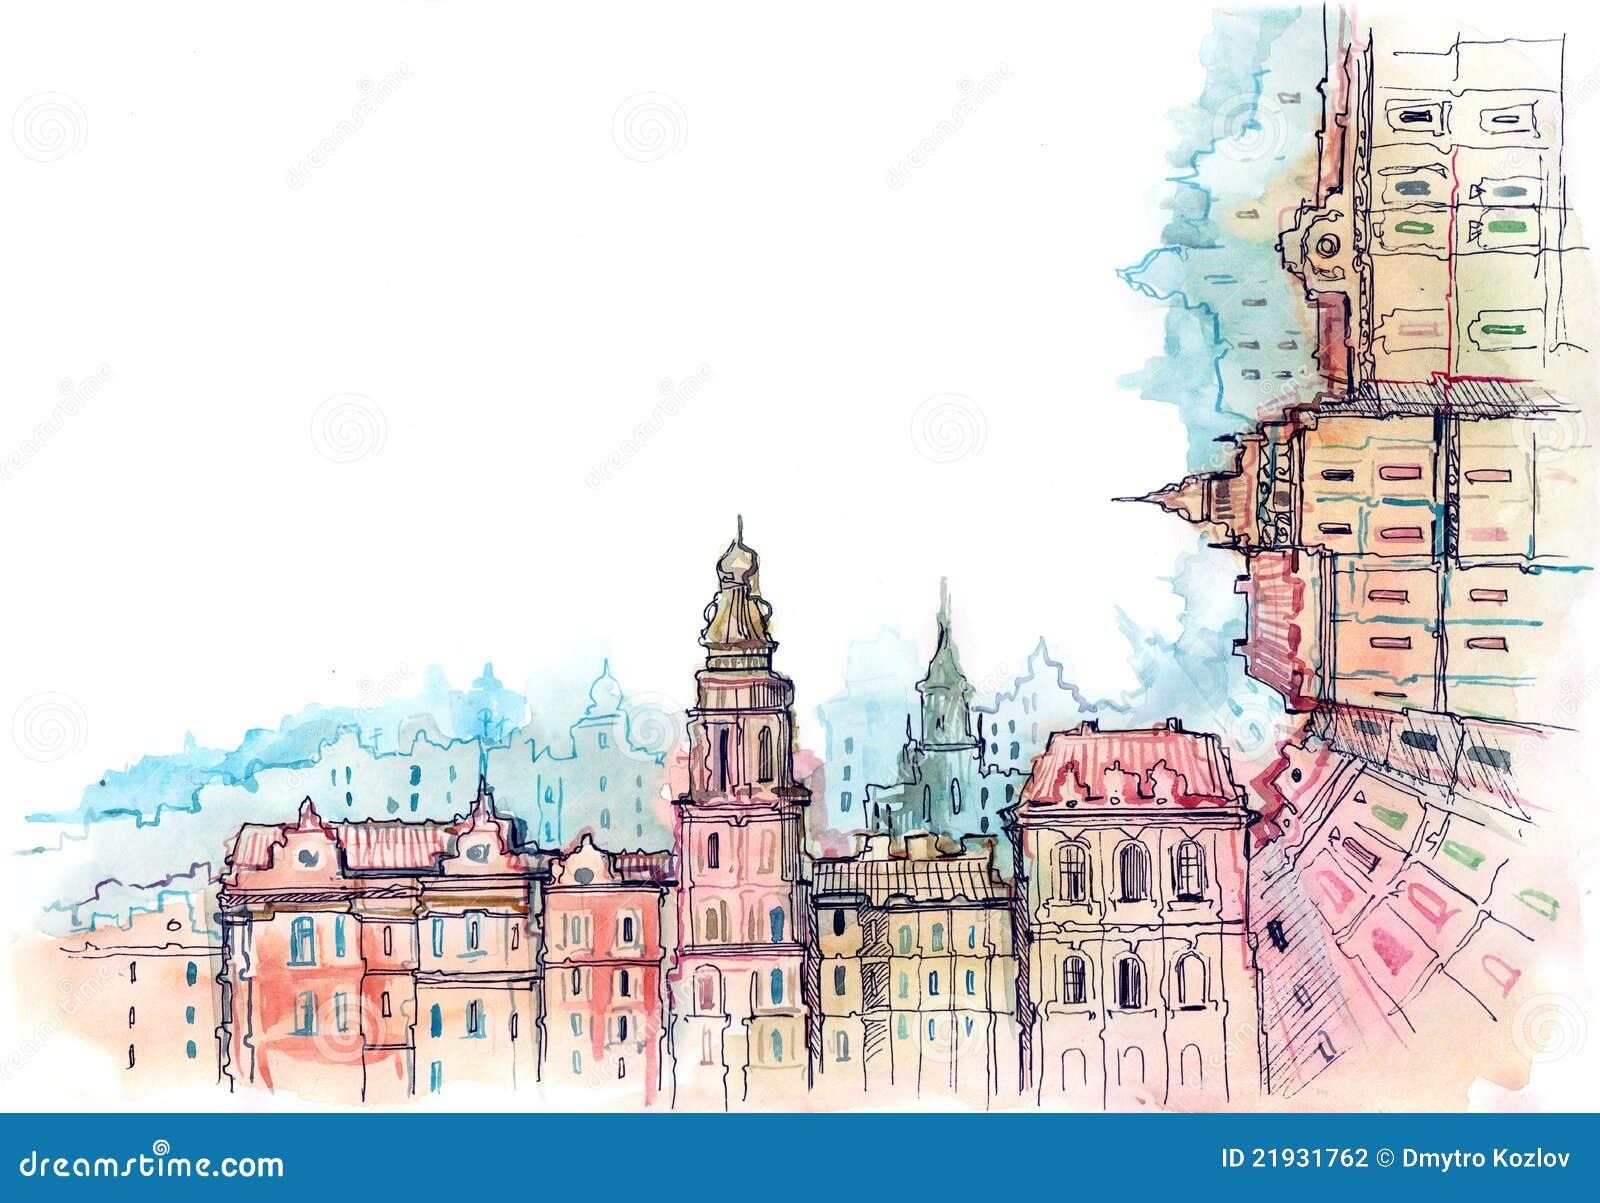 Urban city frame stock illustration. Illustration of buildings ...